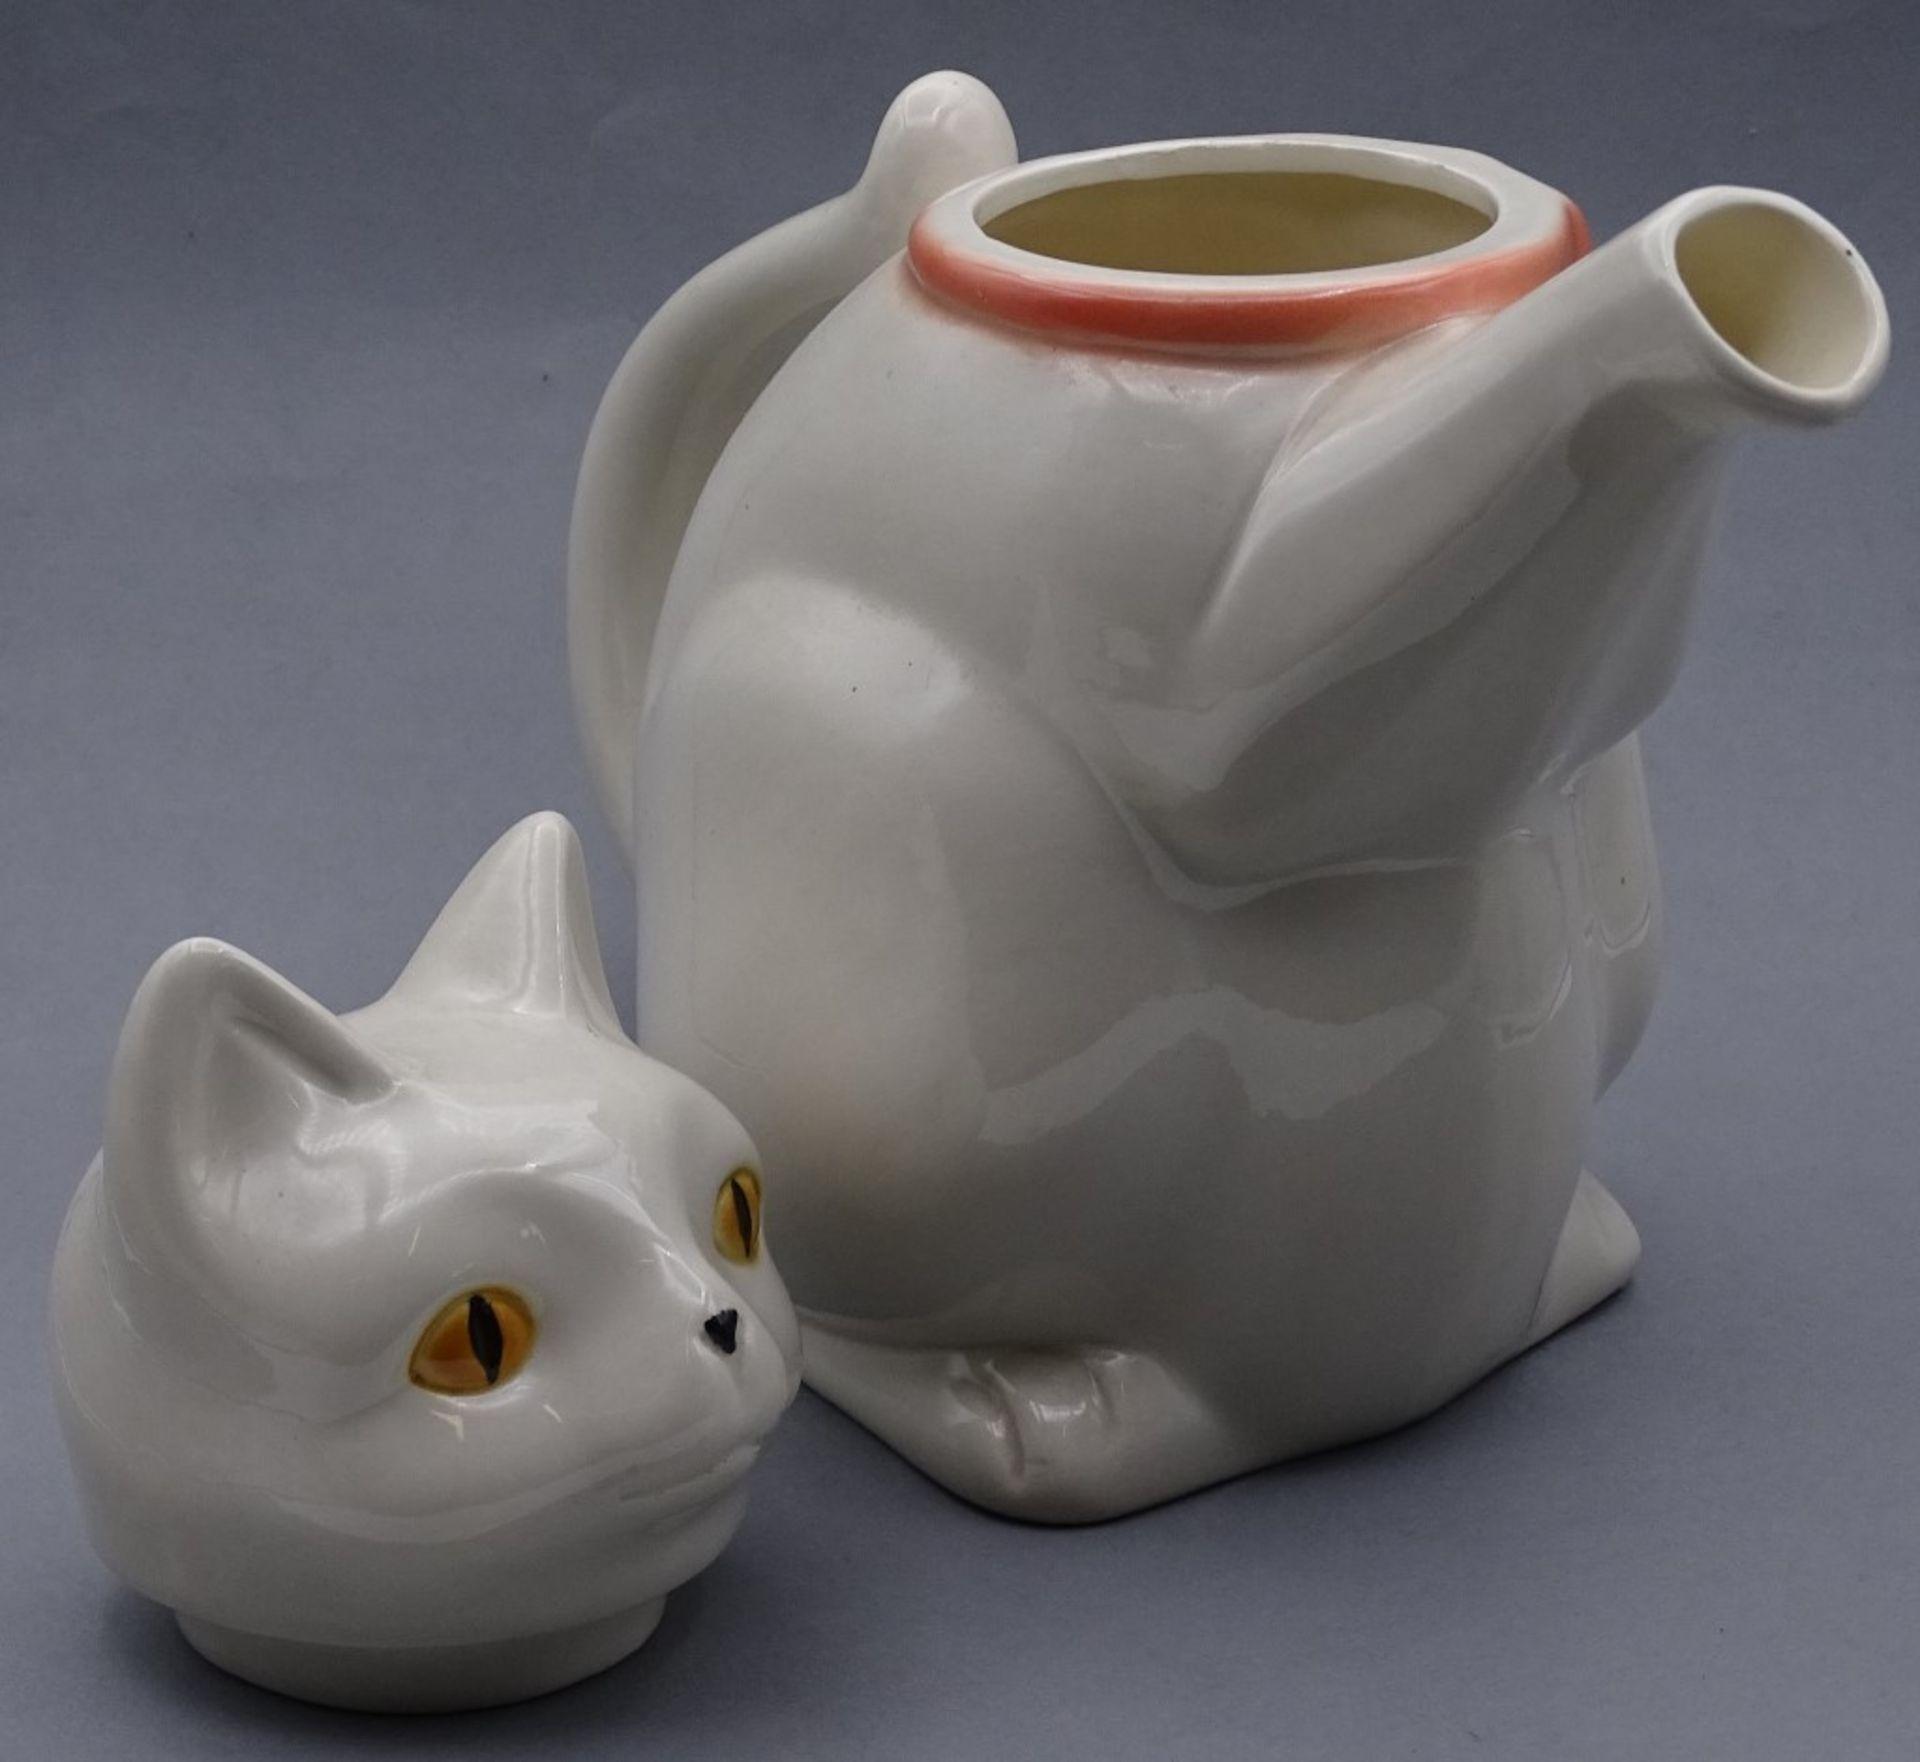 "Goebel Porzellan Kanne ""Katzenkanne""H-22,5cm - Bild 5 aus 5"